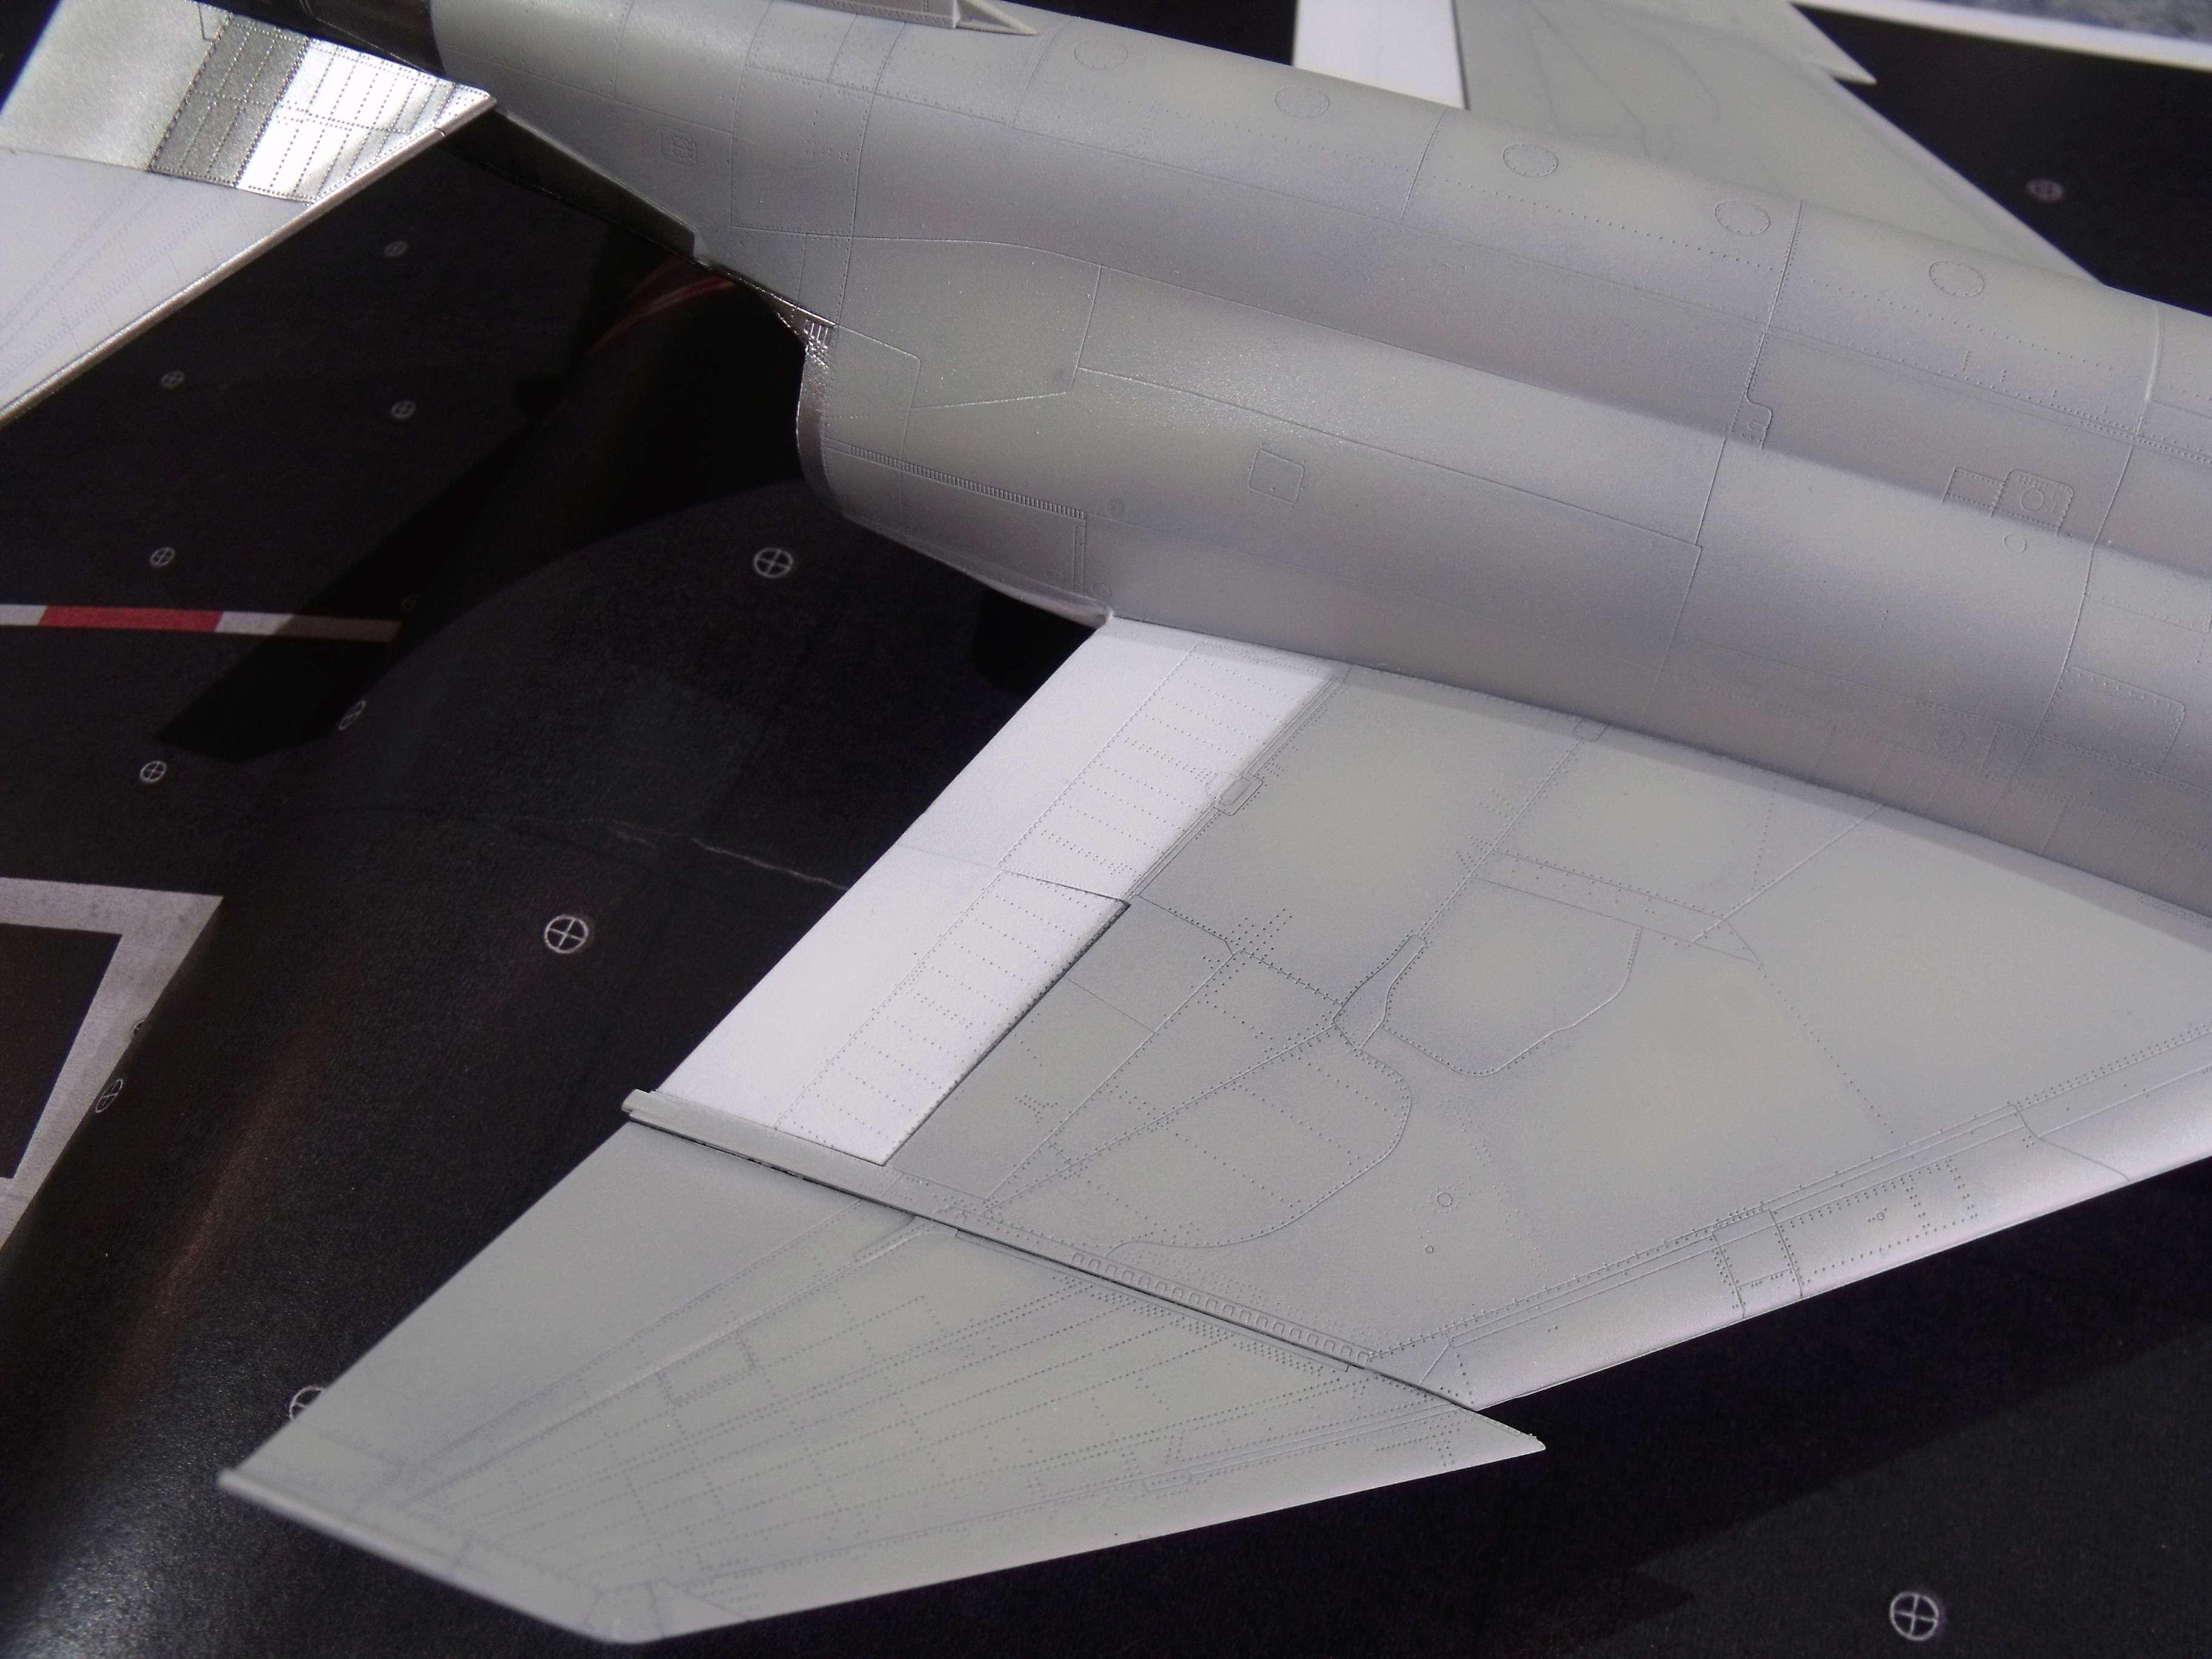 F-4 B Phantom 1/48° - VF-51 - 1972 - Début de patine. - Page 4 Dscf7134